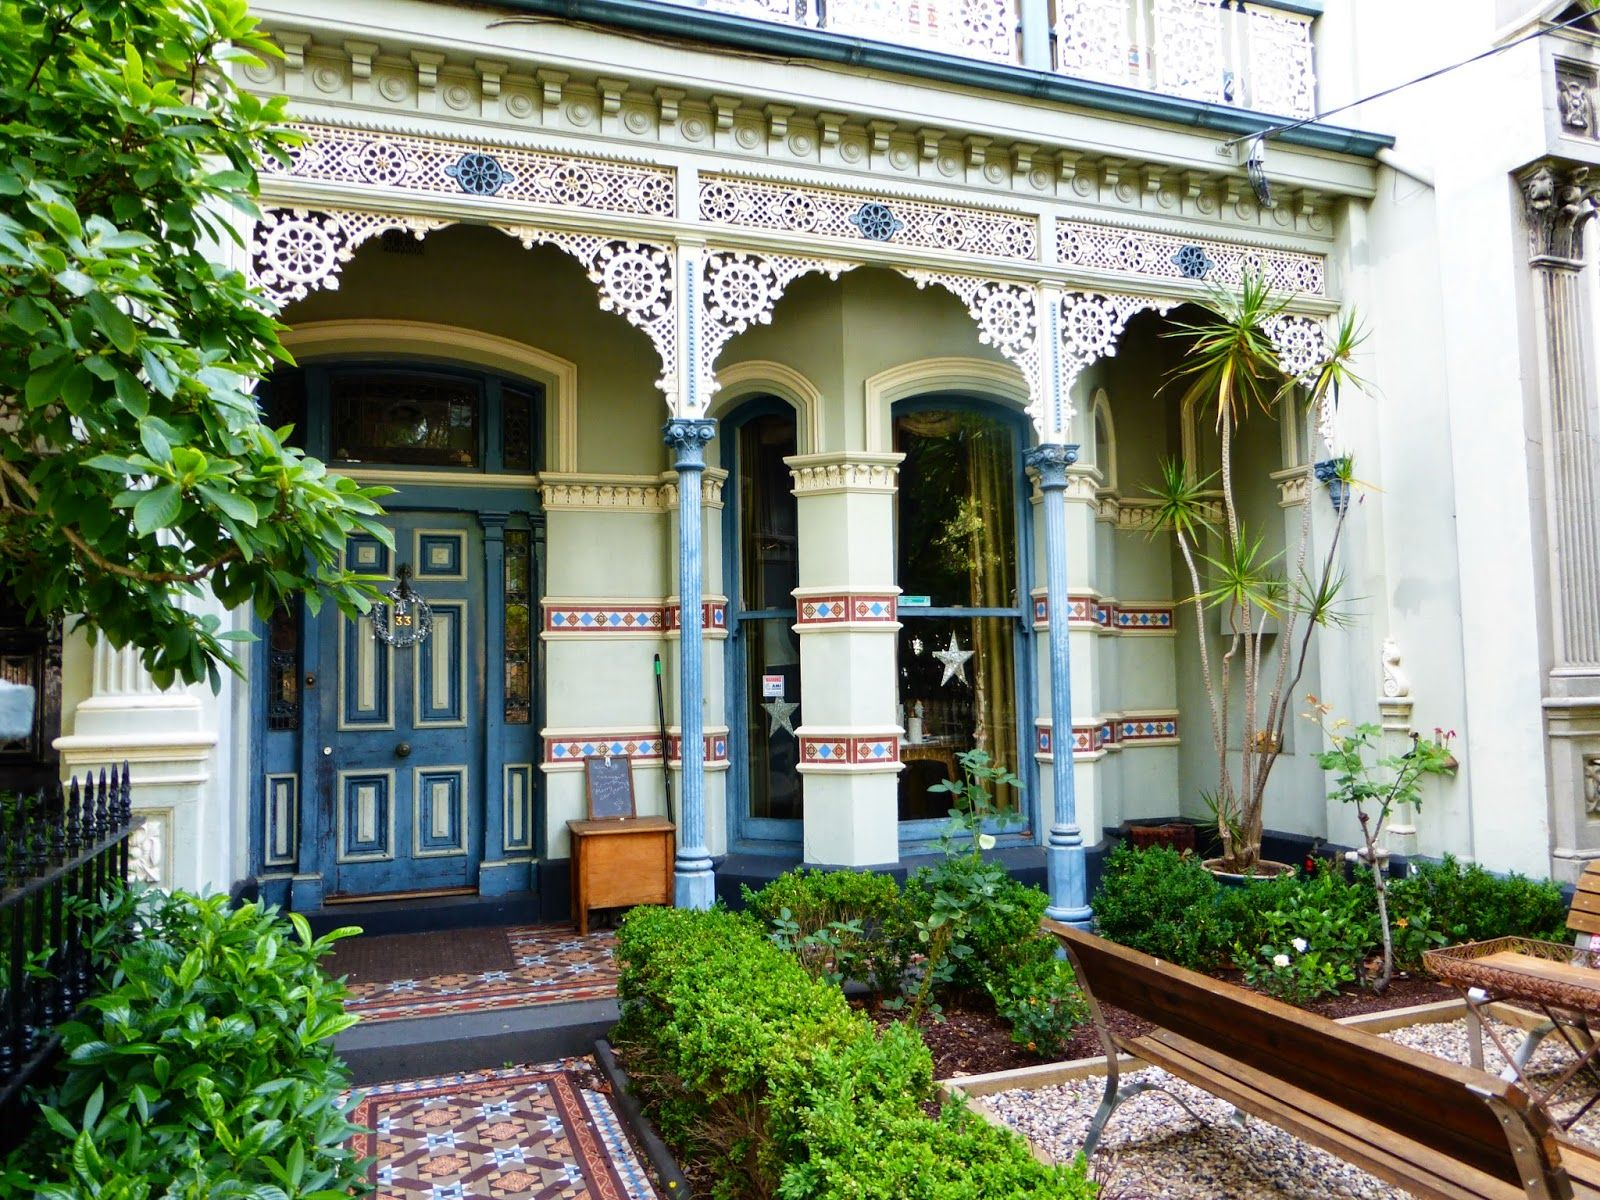 My Vintage Journeys: VICTORIAN HOMES OF MELBOURNE